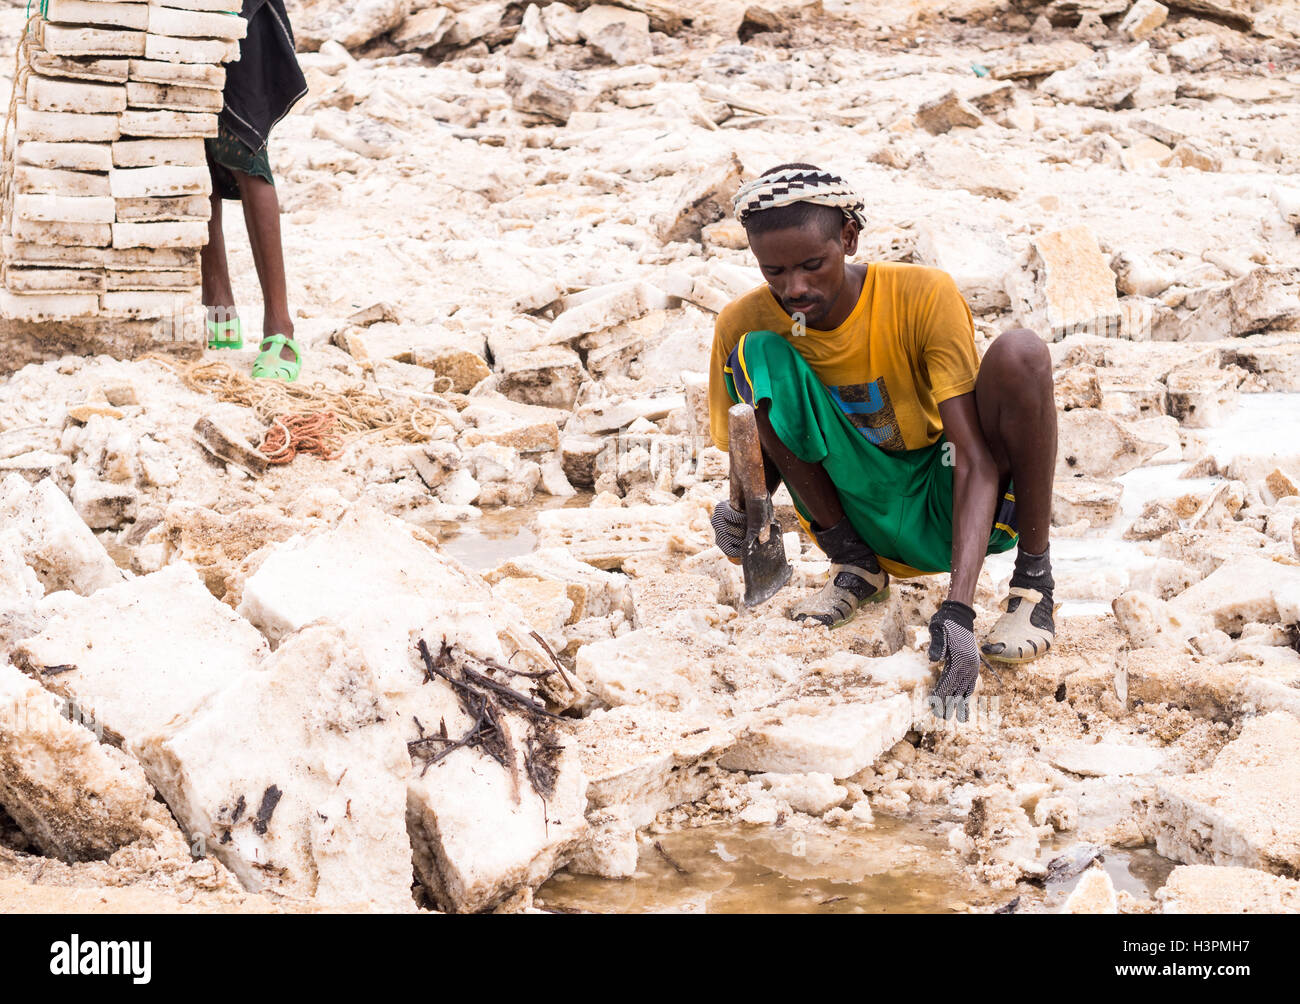 Afar man mining salt from salt flats in Afar region, Danakil Depression, Ethiopia. - Stock Image